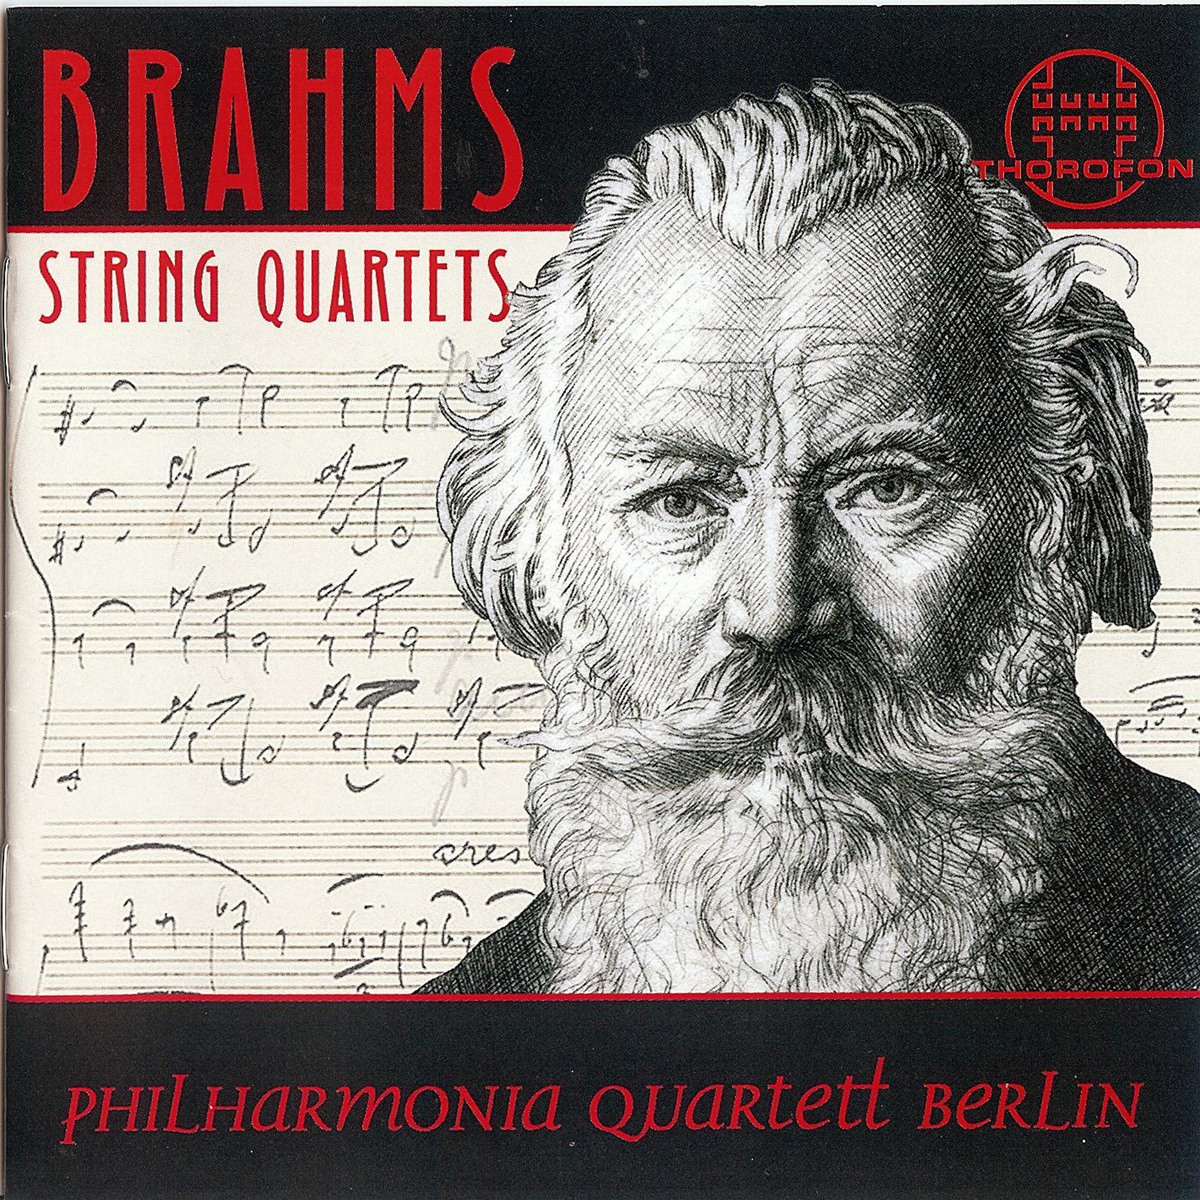 Philharmonia_Quartett_Berlin_Brahms_Streichquartette